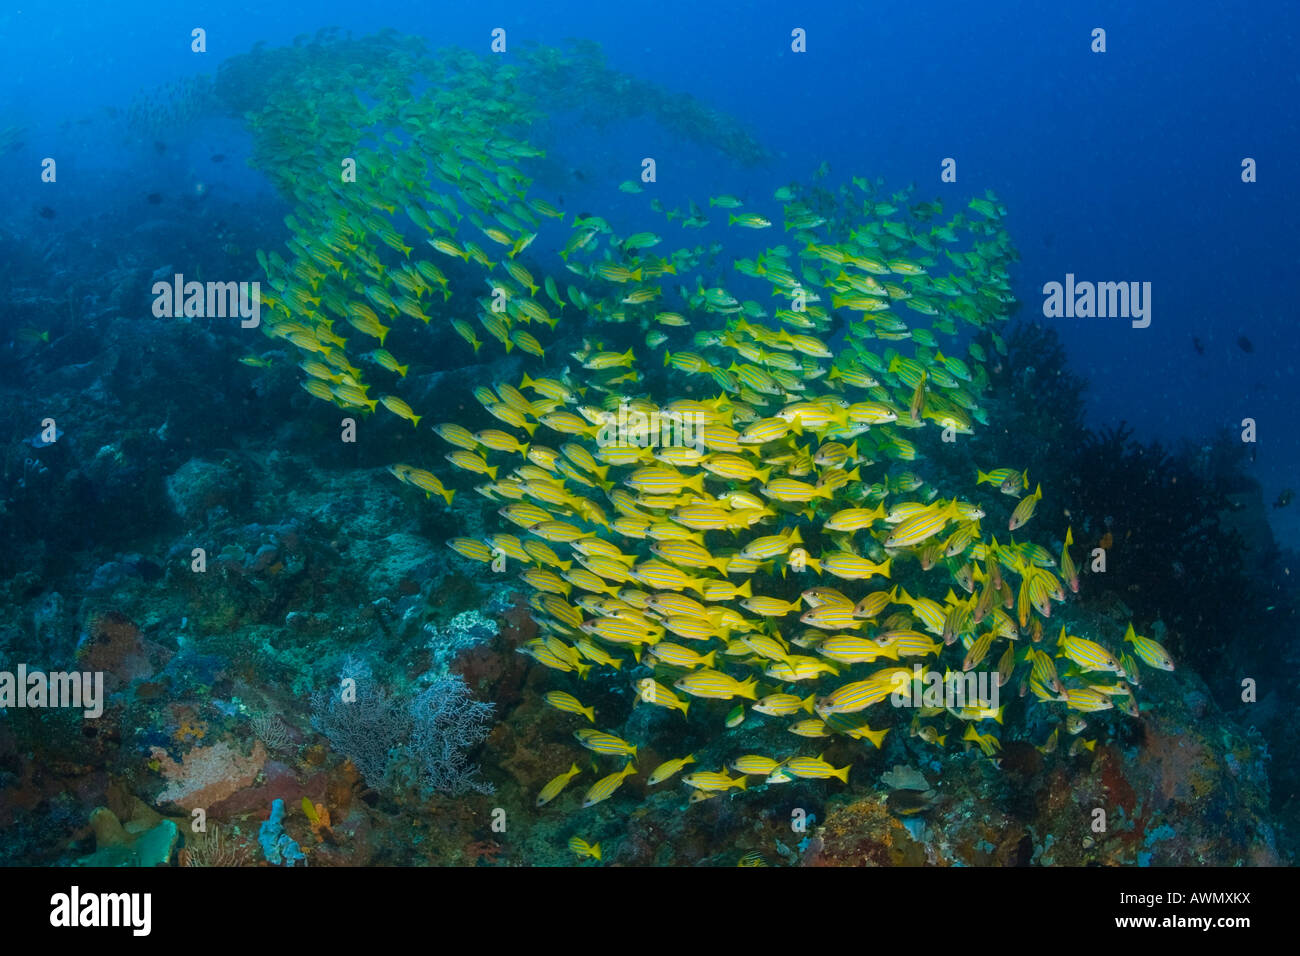 School of Bluestripe Snappers or Bluestripe Sea Perches (Lutjanus kasmira), Indonesia, Asia Stock Photo